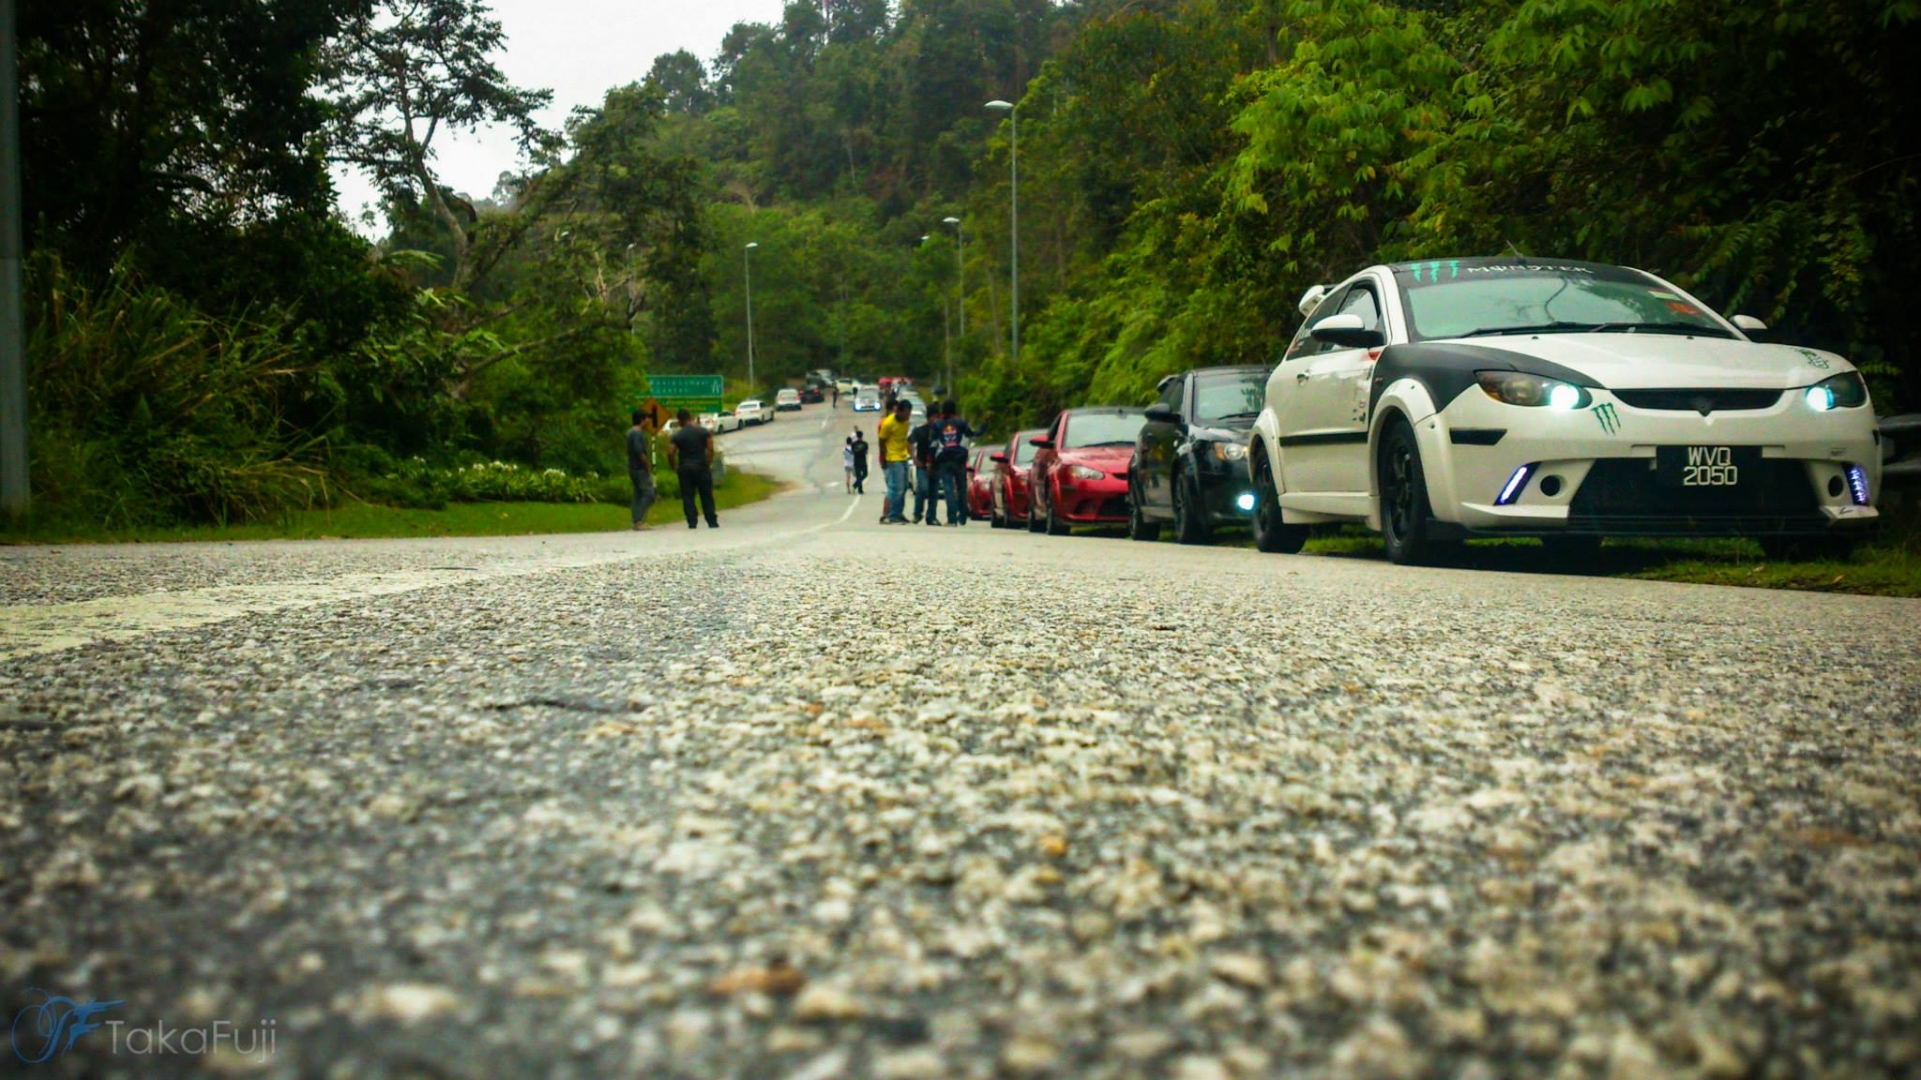 Malaysia Hillroad Community